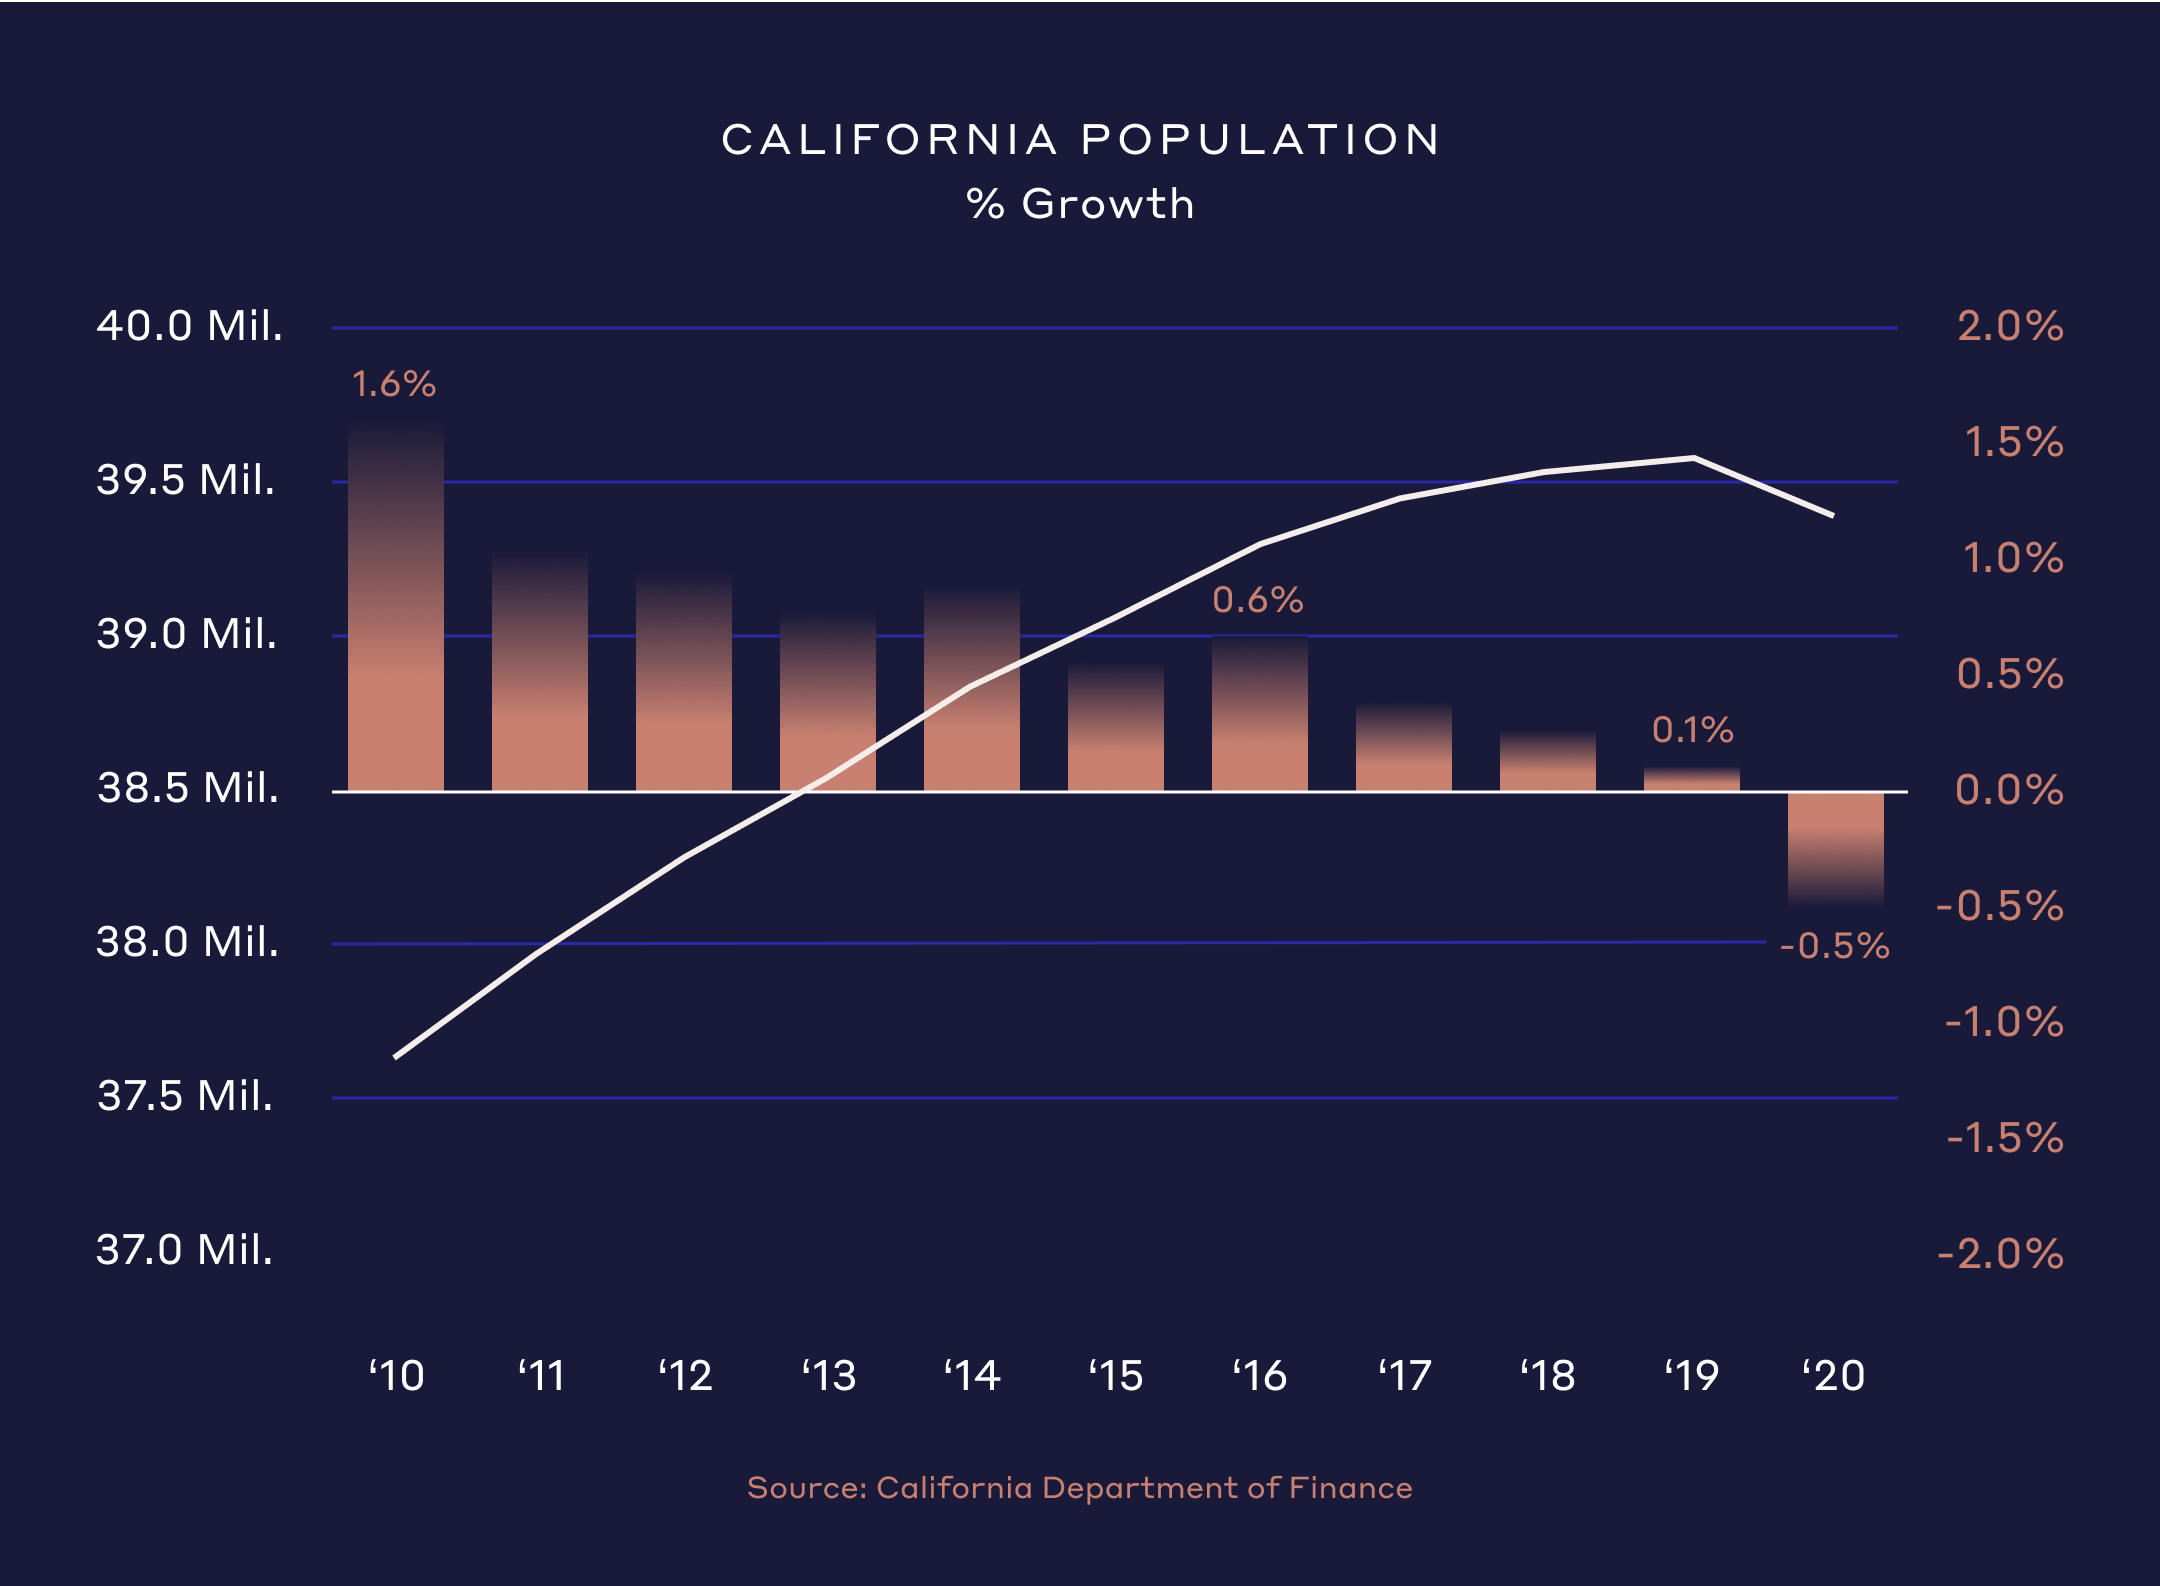 California Population % of Growth